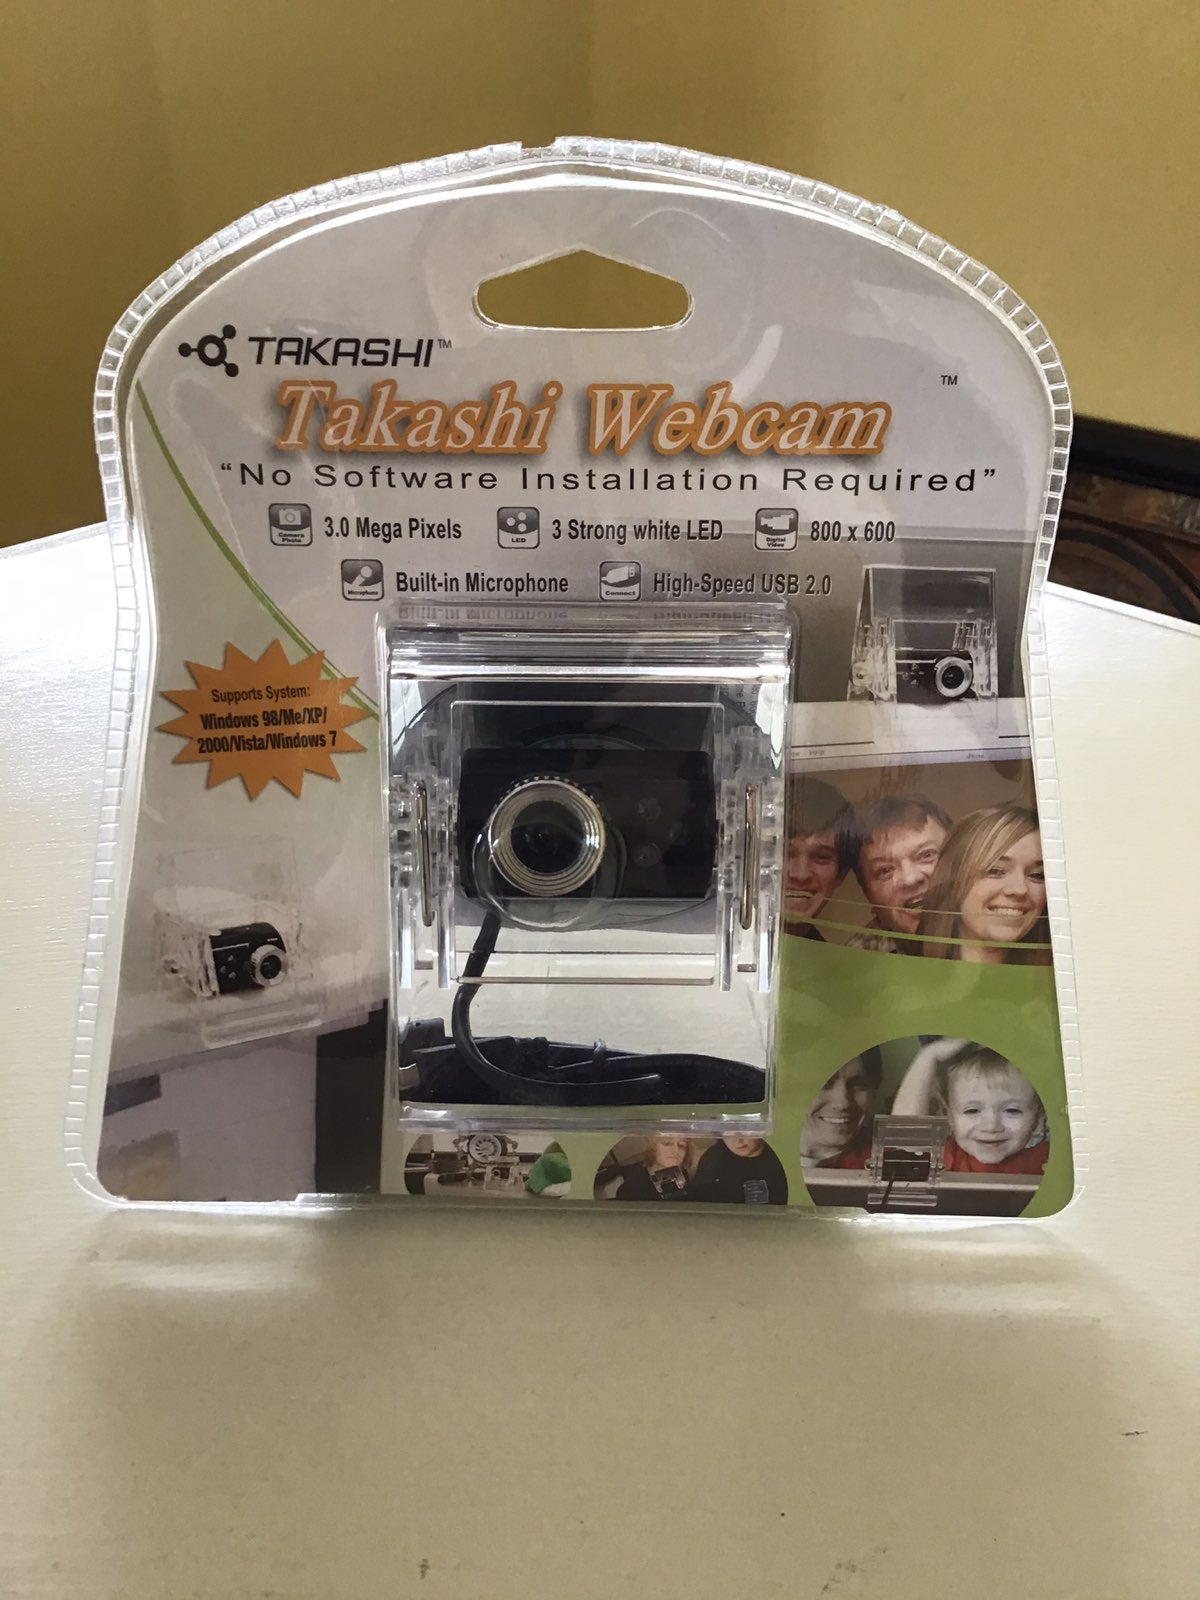 Takashi Webcam